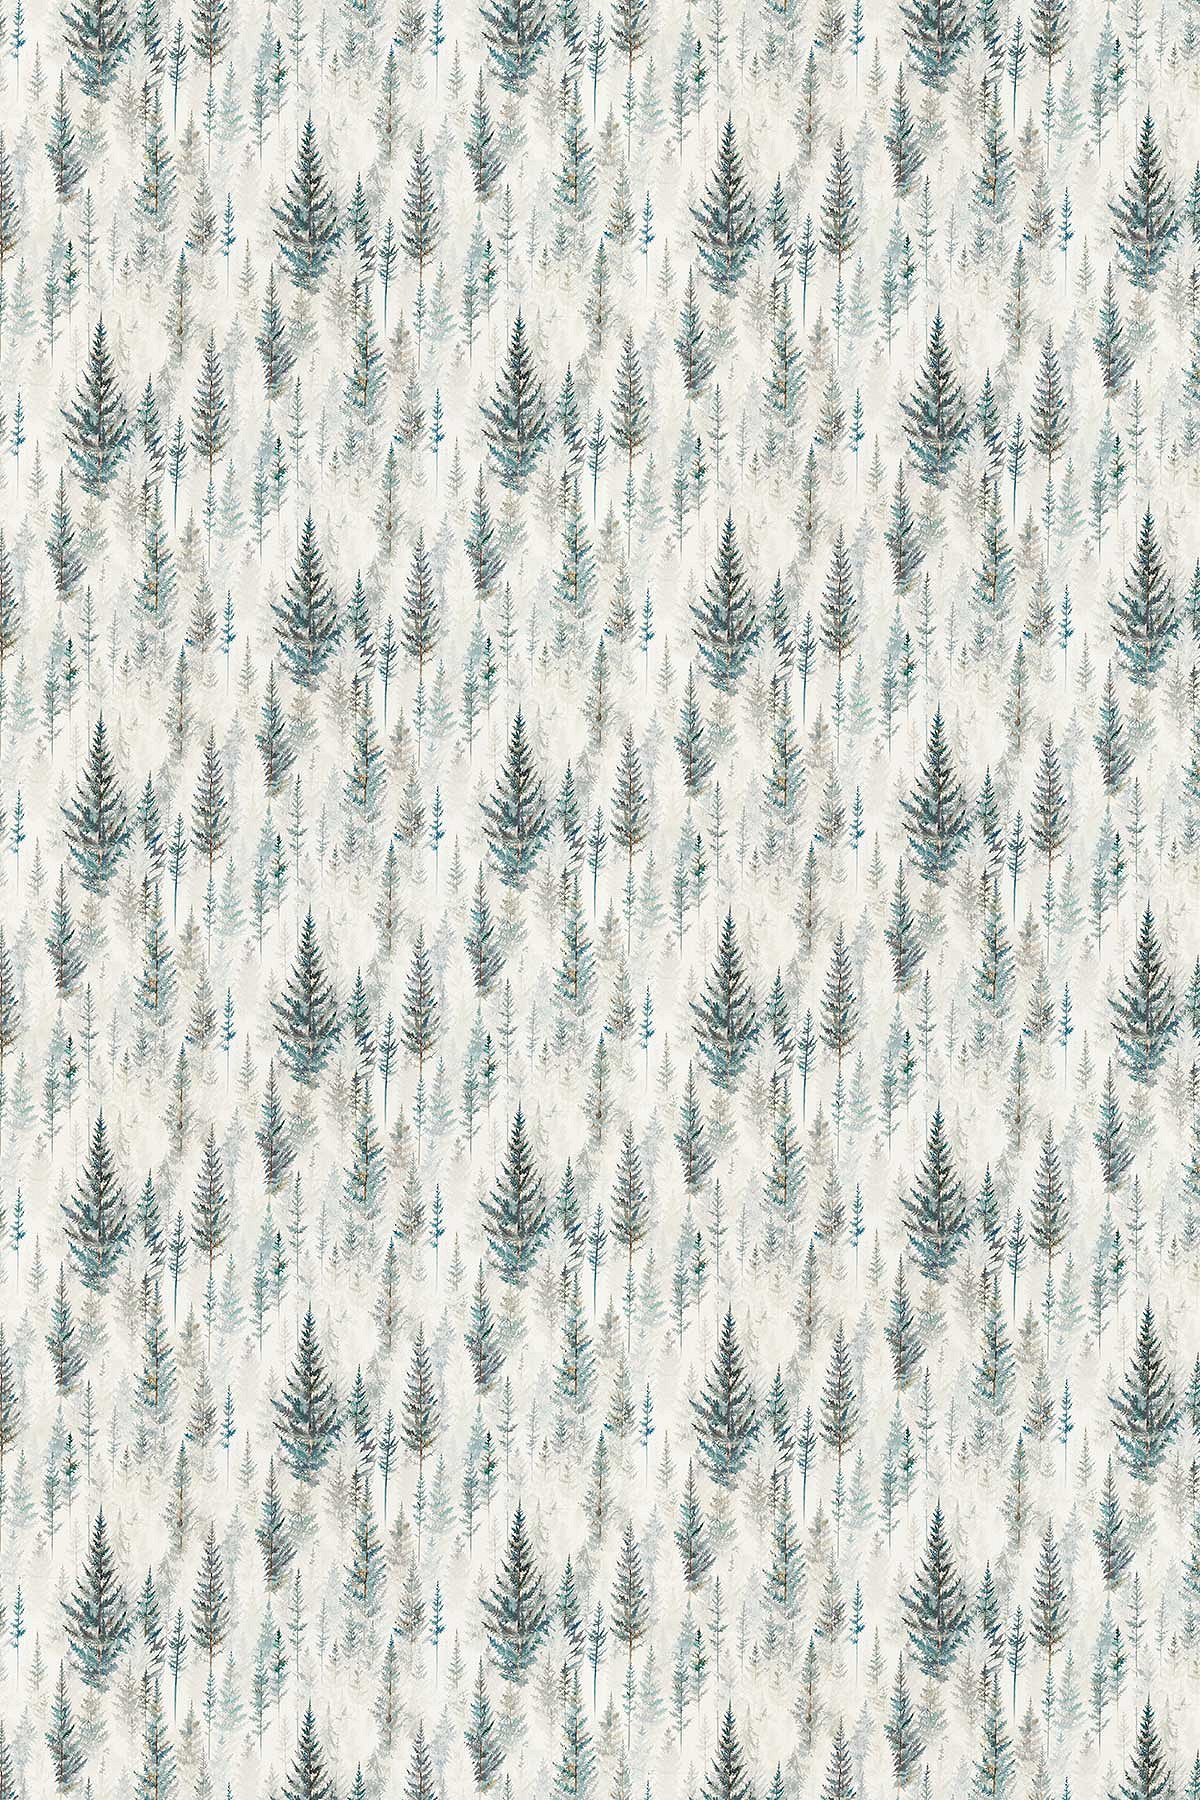 Sanderson Fabric Juniper Pine 226534